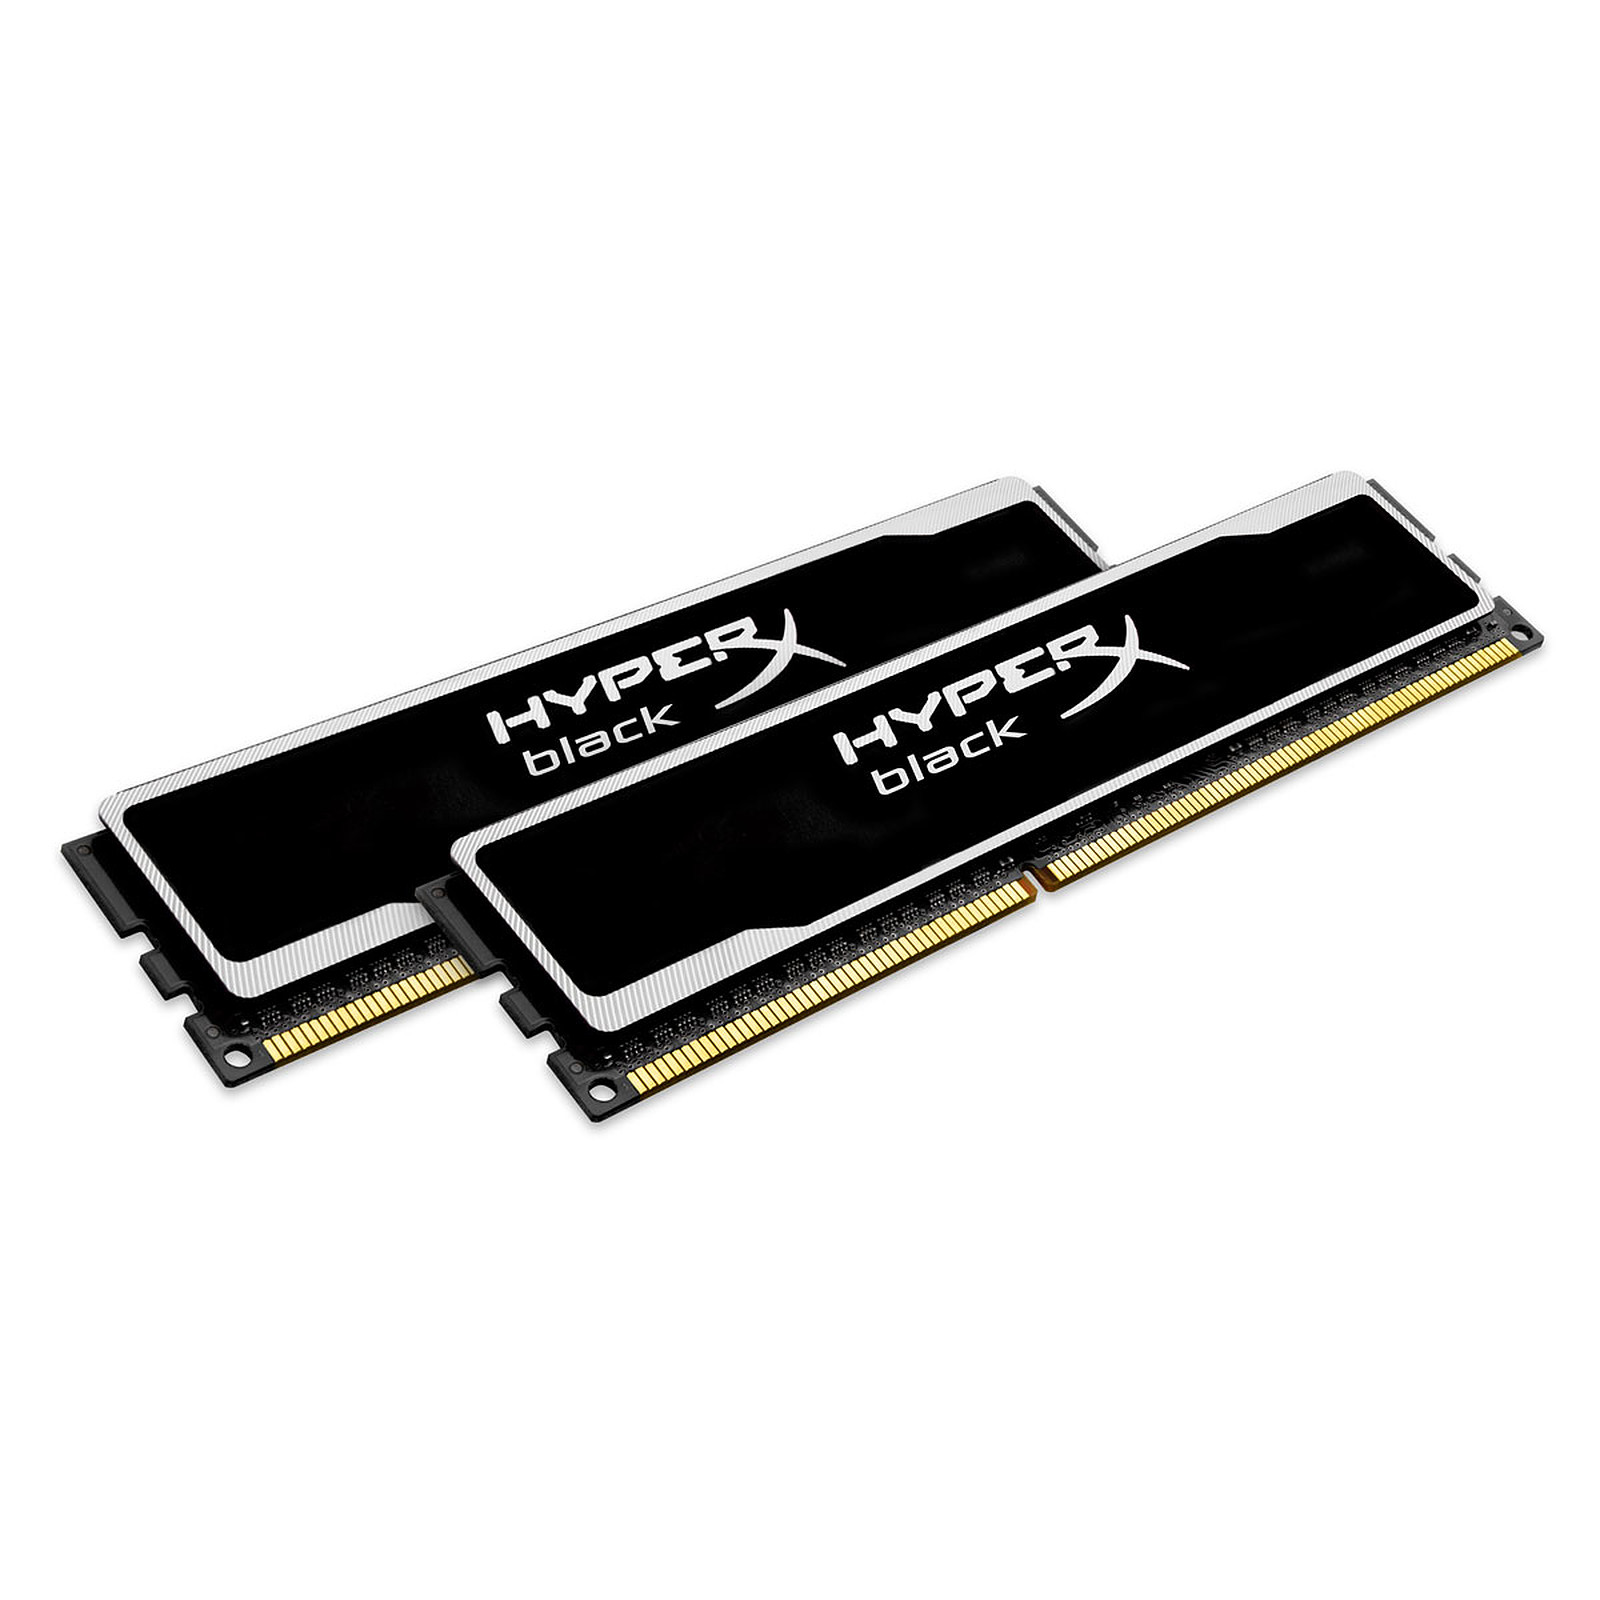 Kingston HyperX black 16 Go (2x 8 Go) DDR3 1333 MHz CL9